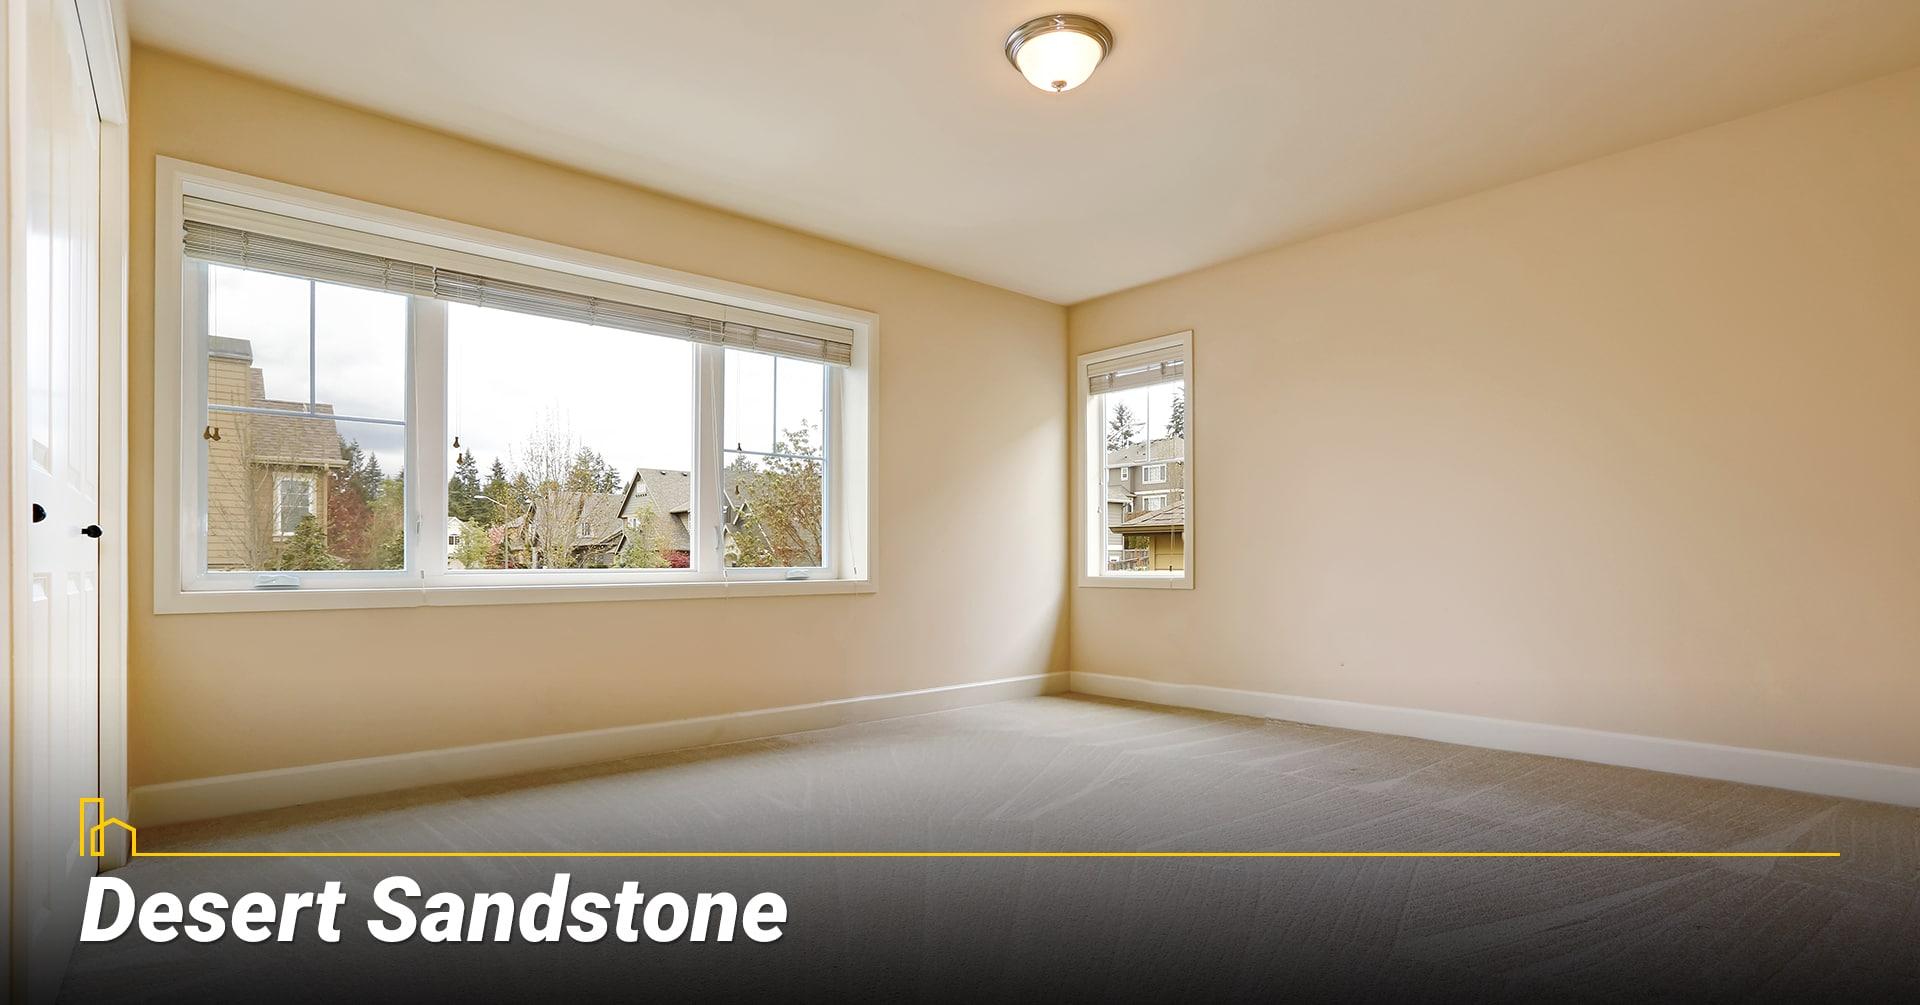 Desert Sandstone, Consider sandy tone color